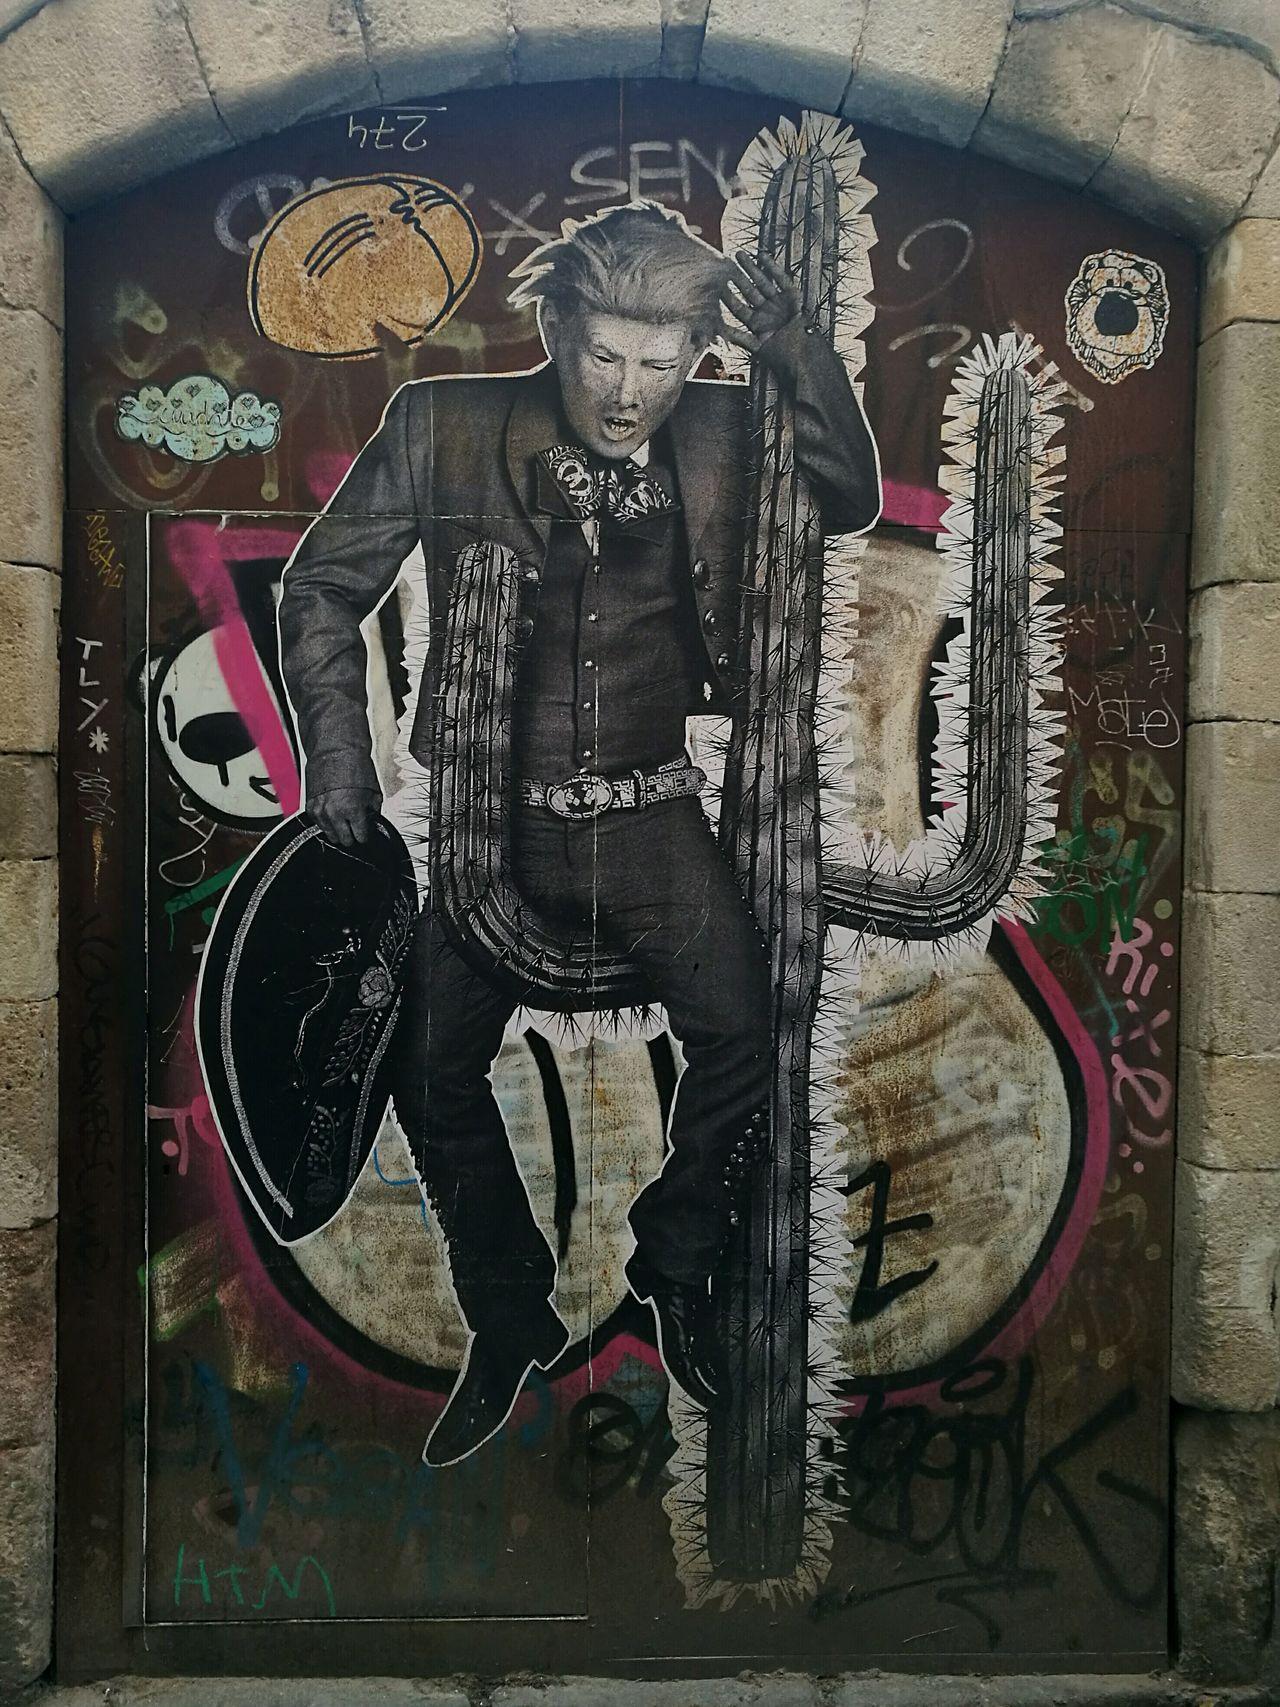 Streetphotographer Streetphoto Catalonia City Graffiti Graffiti Wall Text Day Art, Drawing, Creativity Artstreet Arteurbano Artstreet Close-up No People Day Indoors  Barcelona Barcelona Streets